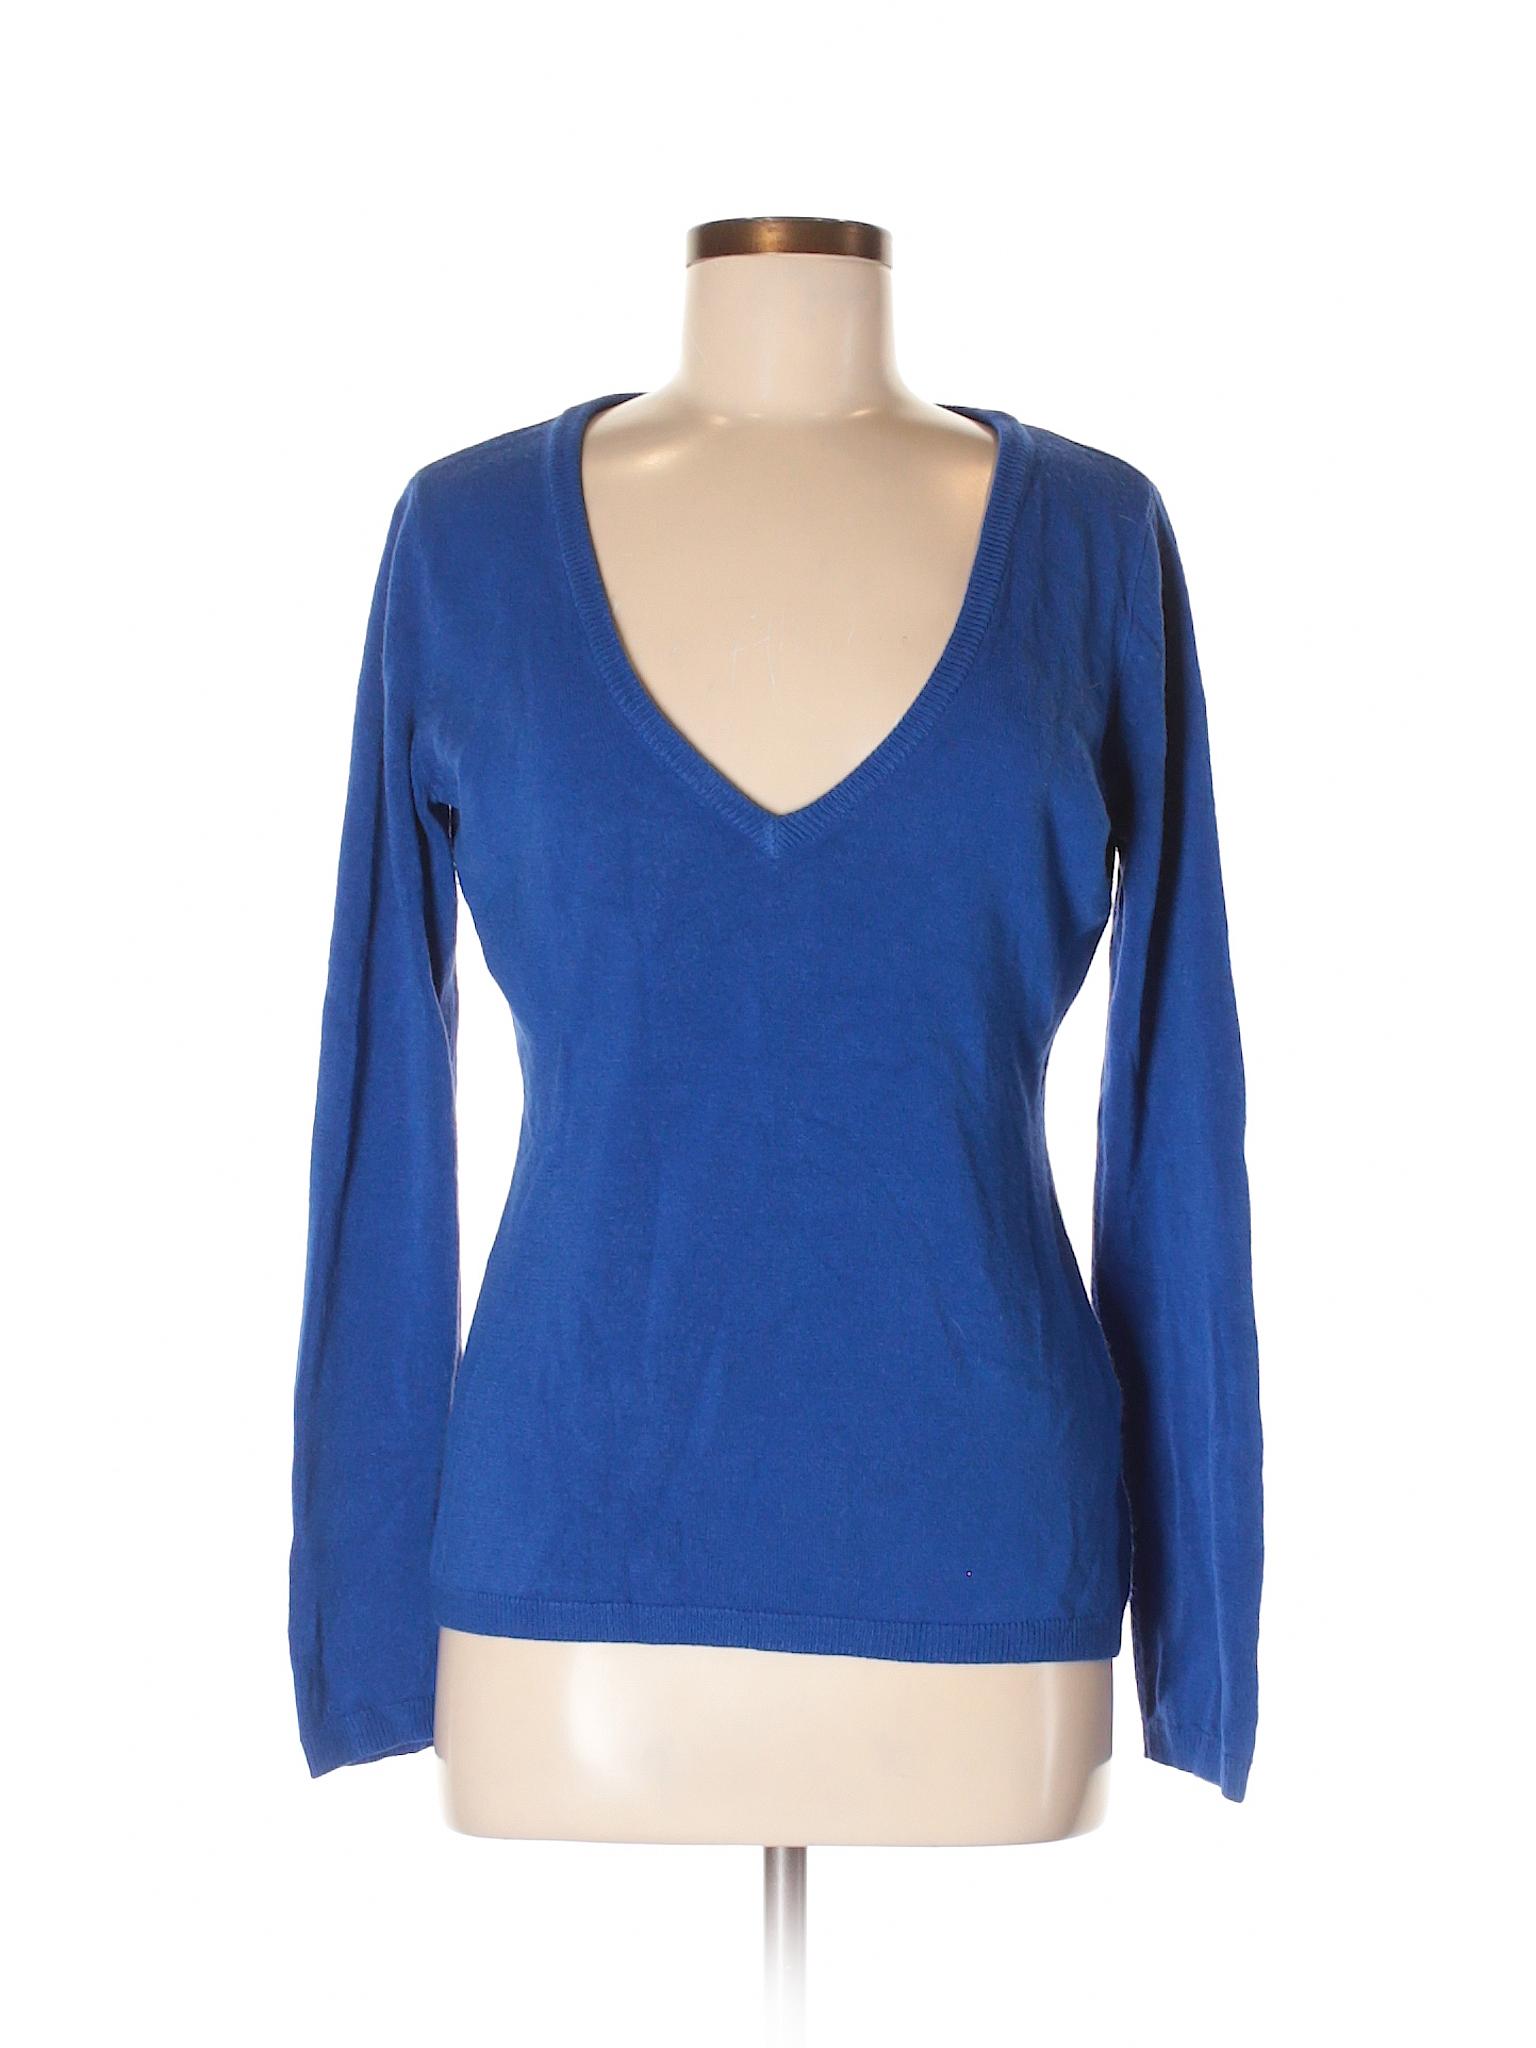 York New amp; Pullover Sweater Boutique Company YTzwgxq1